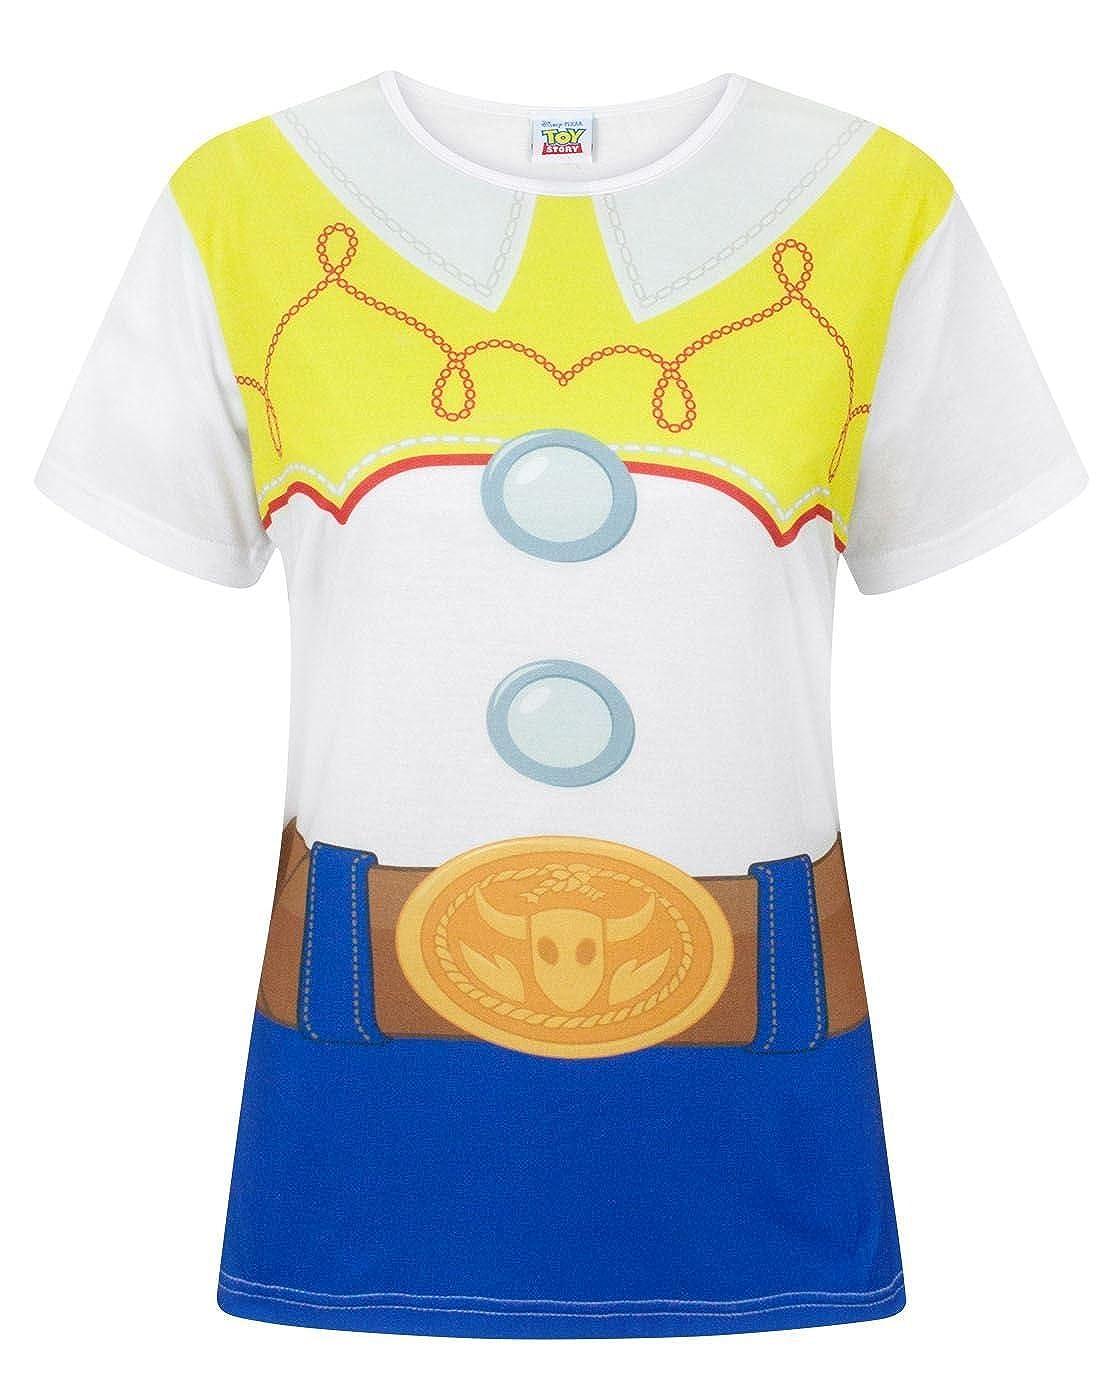 Disney Toy Story Jessie Costume Women's T-Shirt